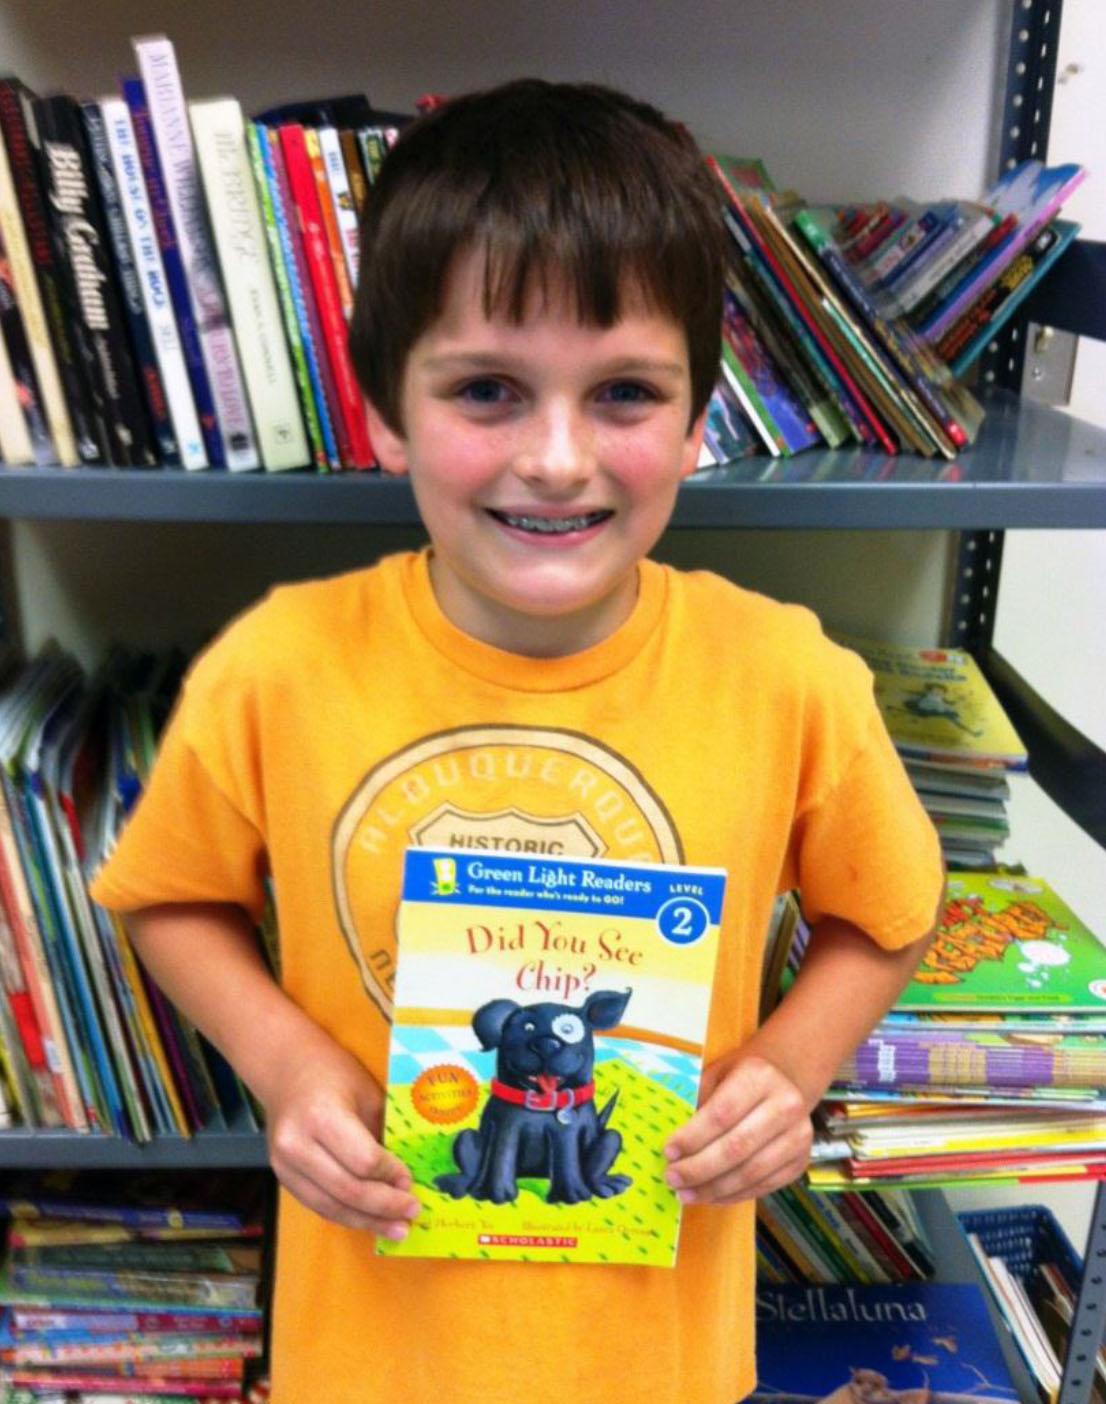 Thank you, Brendan Sandnes, for your donation of children's books to Joplin NALA Read!